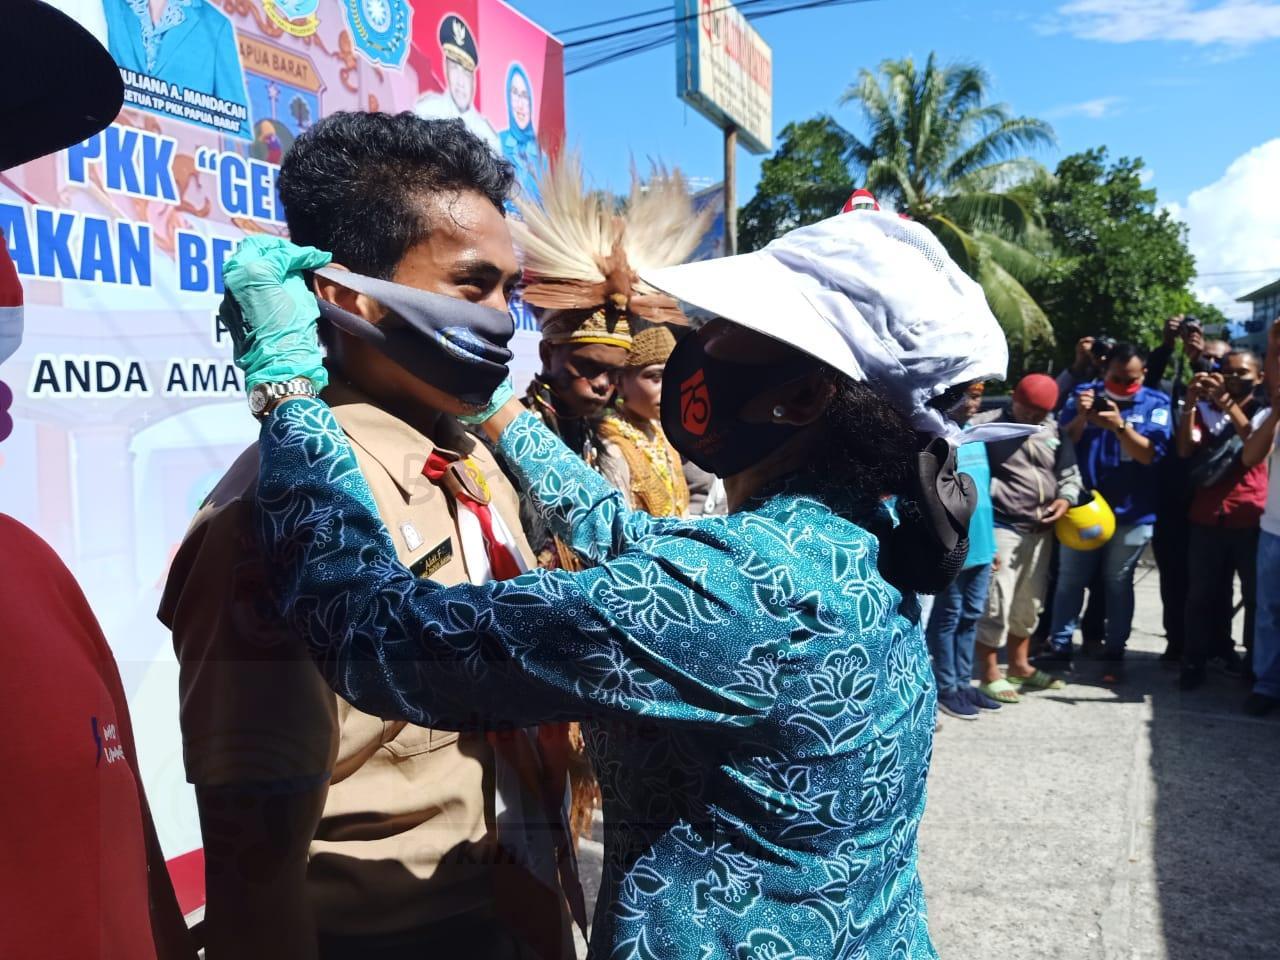 PKK Papua Barat Bagikan 10.000 Masker Kepada Pengendara di Manokwari 18 IMG 20200817 WA0163